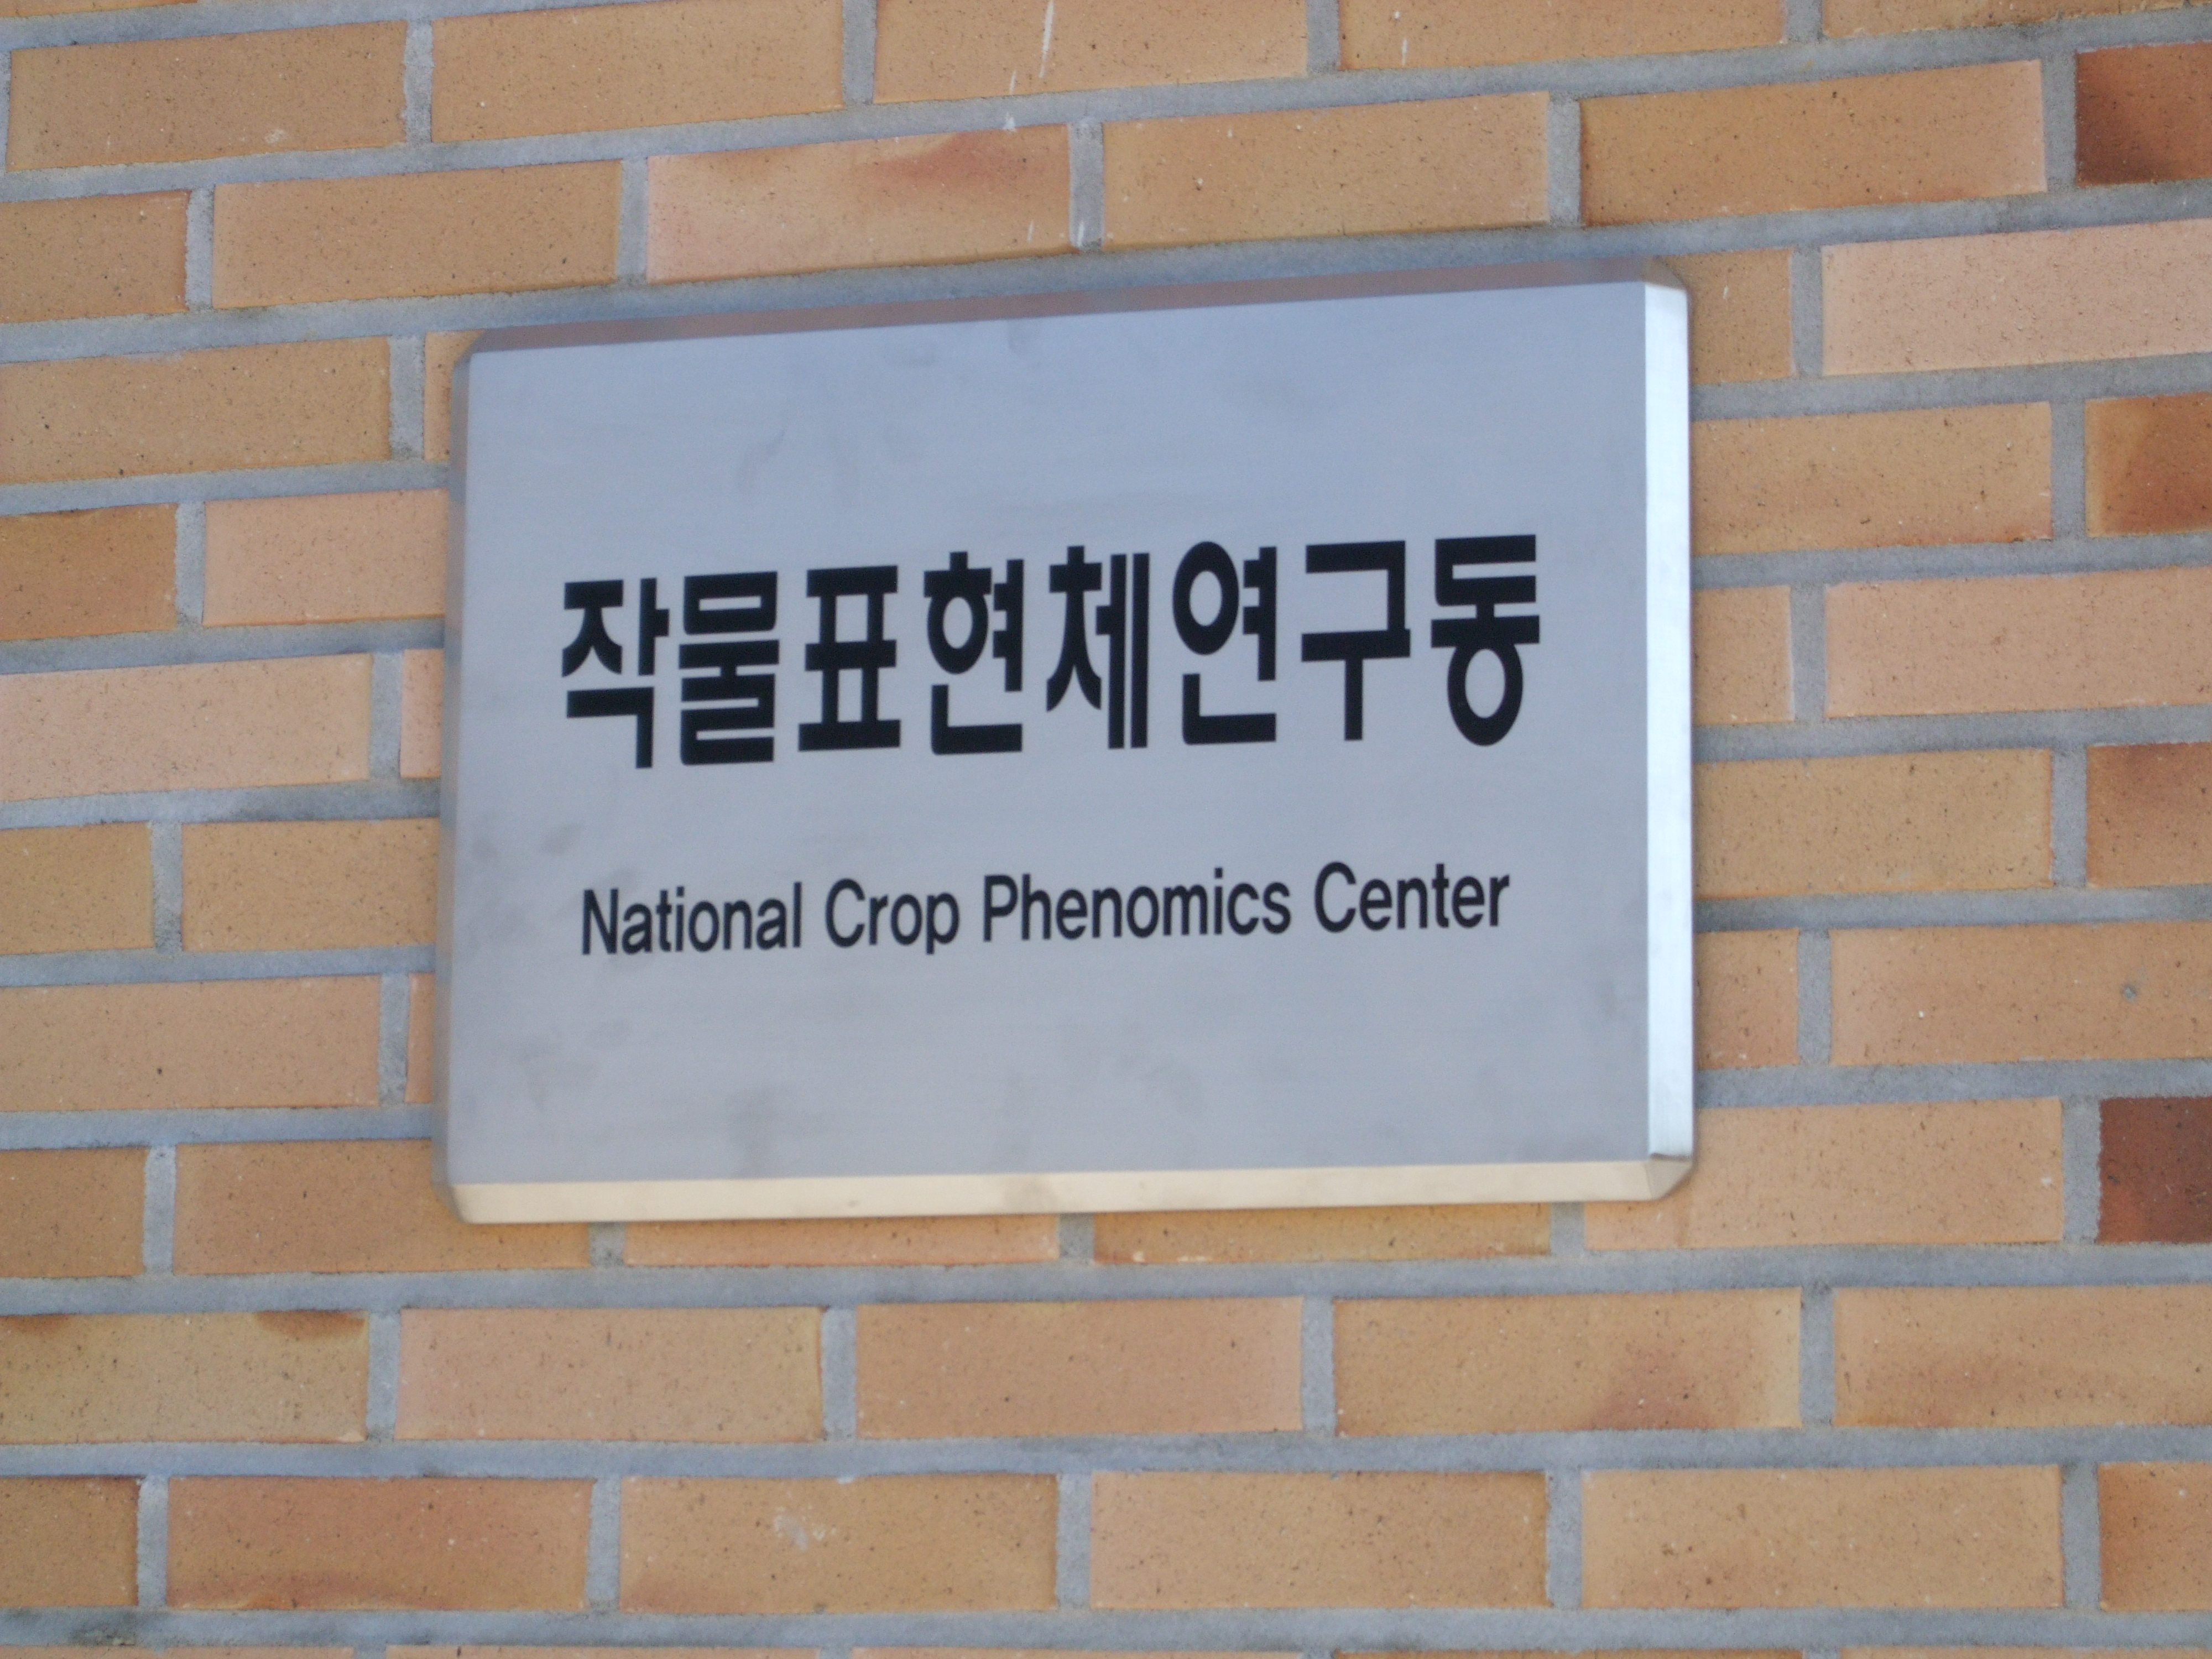 National Crop Phenomics Center at NAAS, Jeonju, Korea